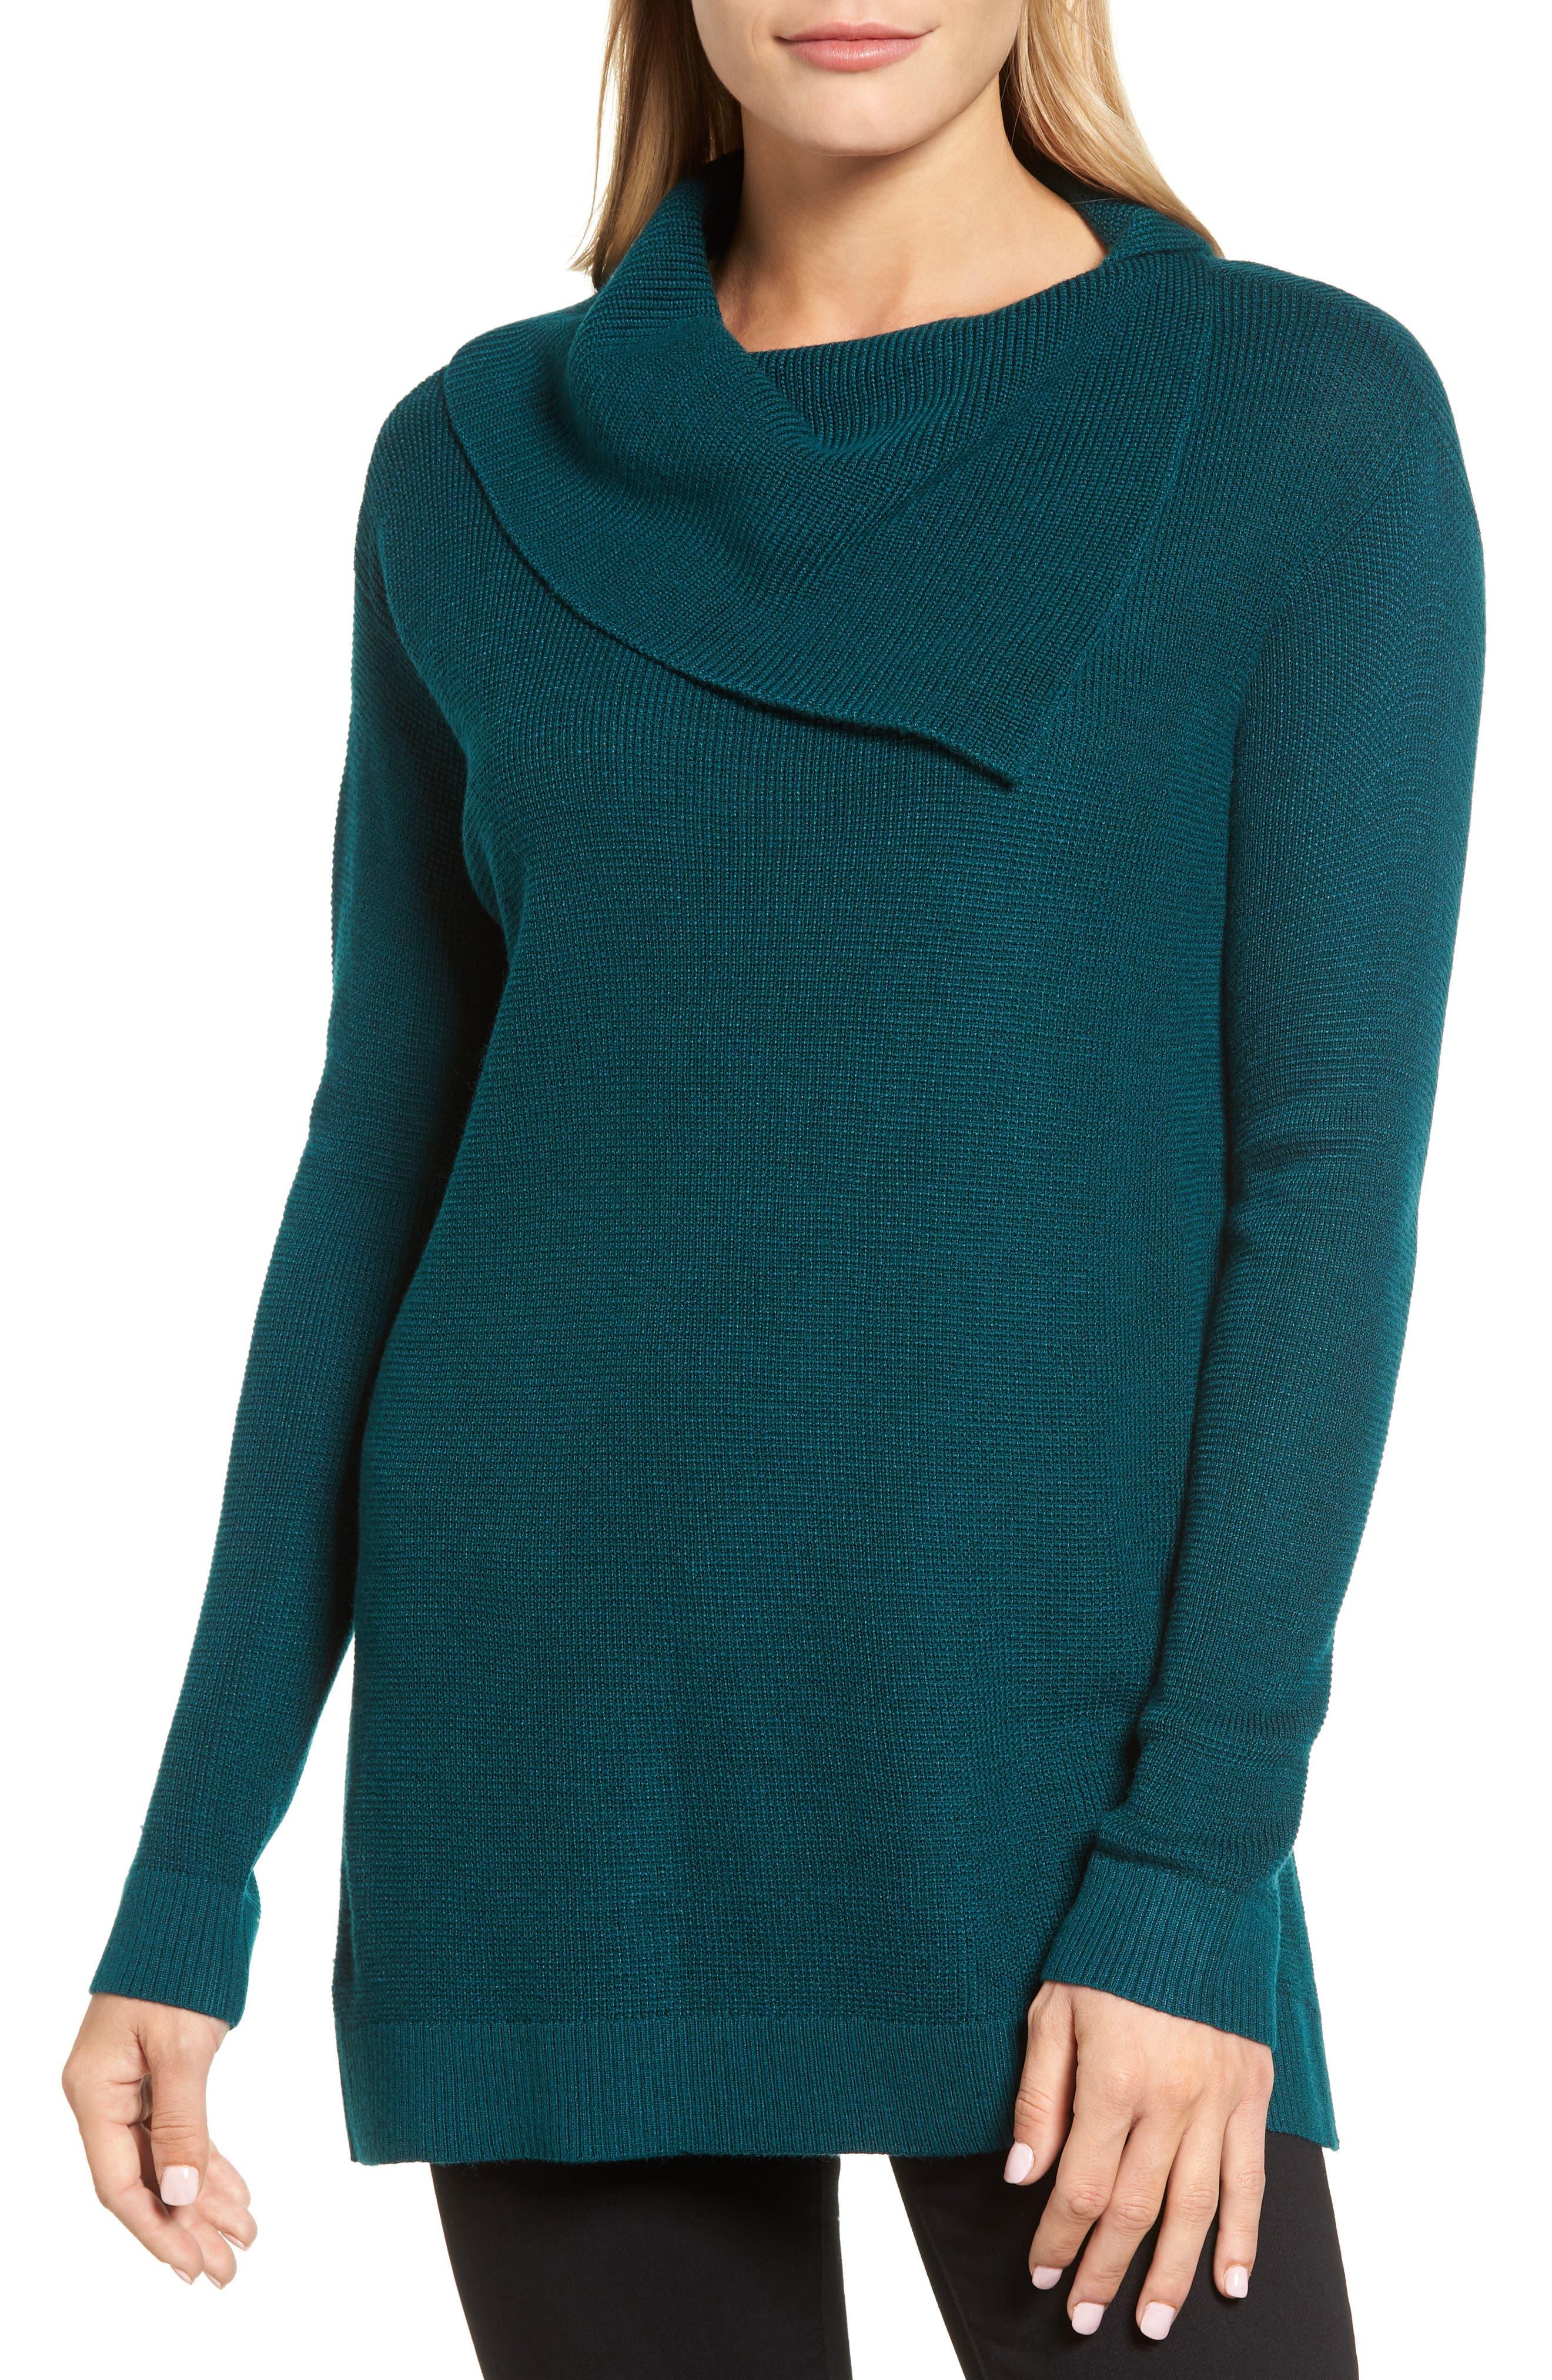 Vince Camuto Sweater (Regular & Petite)